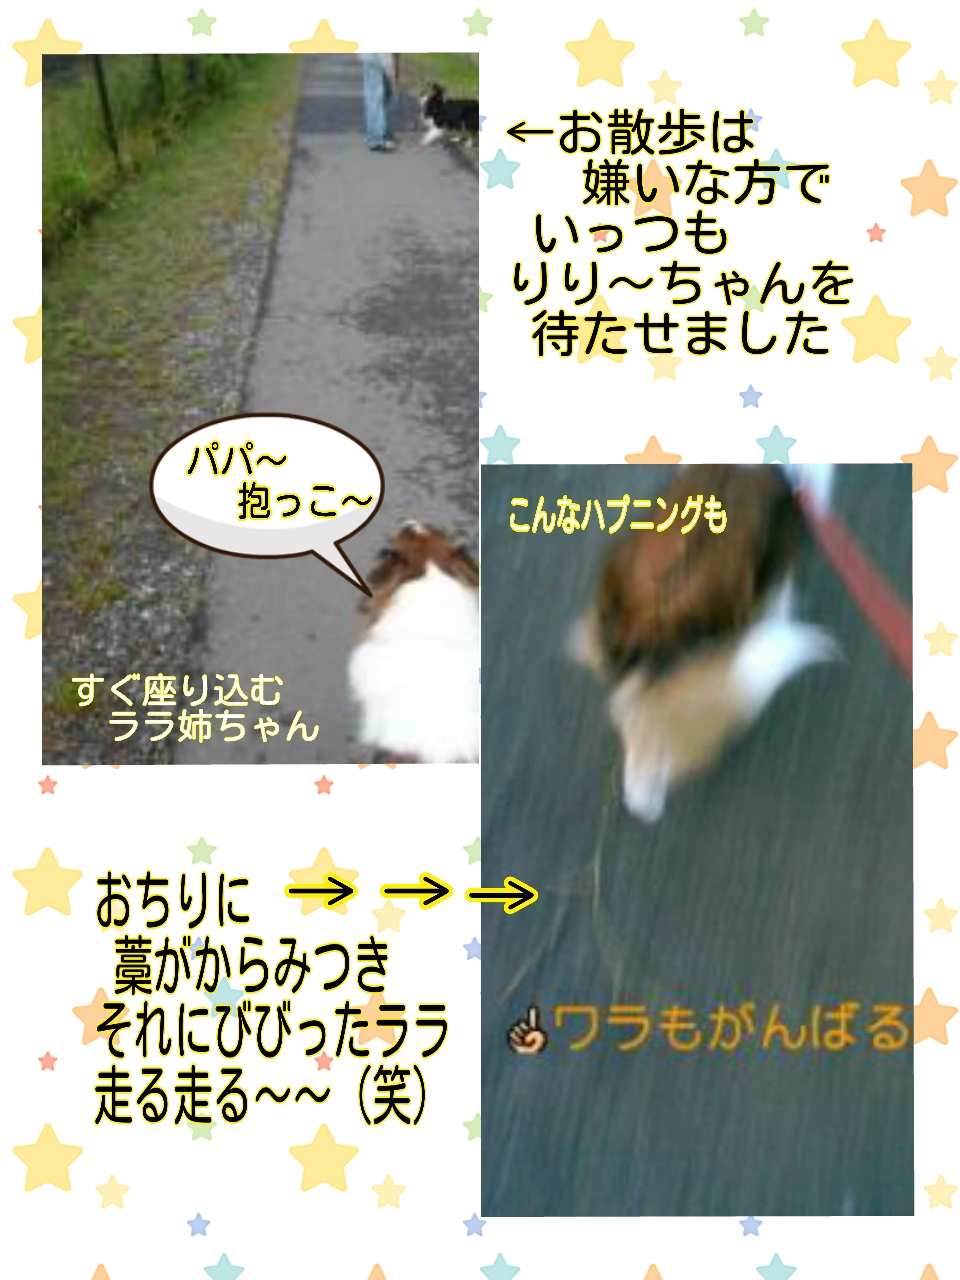 2015-07-09-13-35-29_deco.jpg